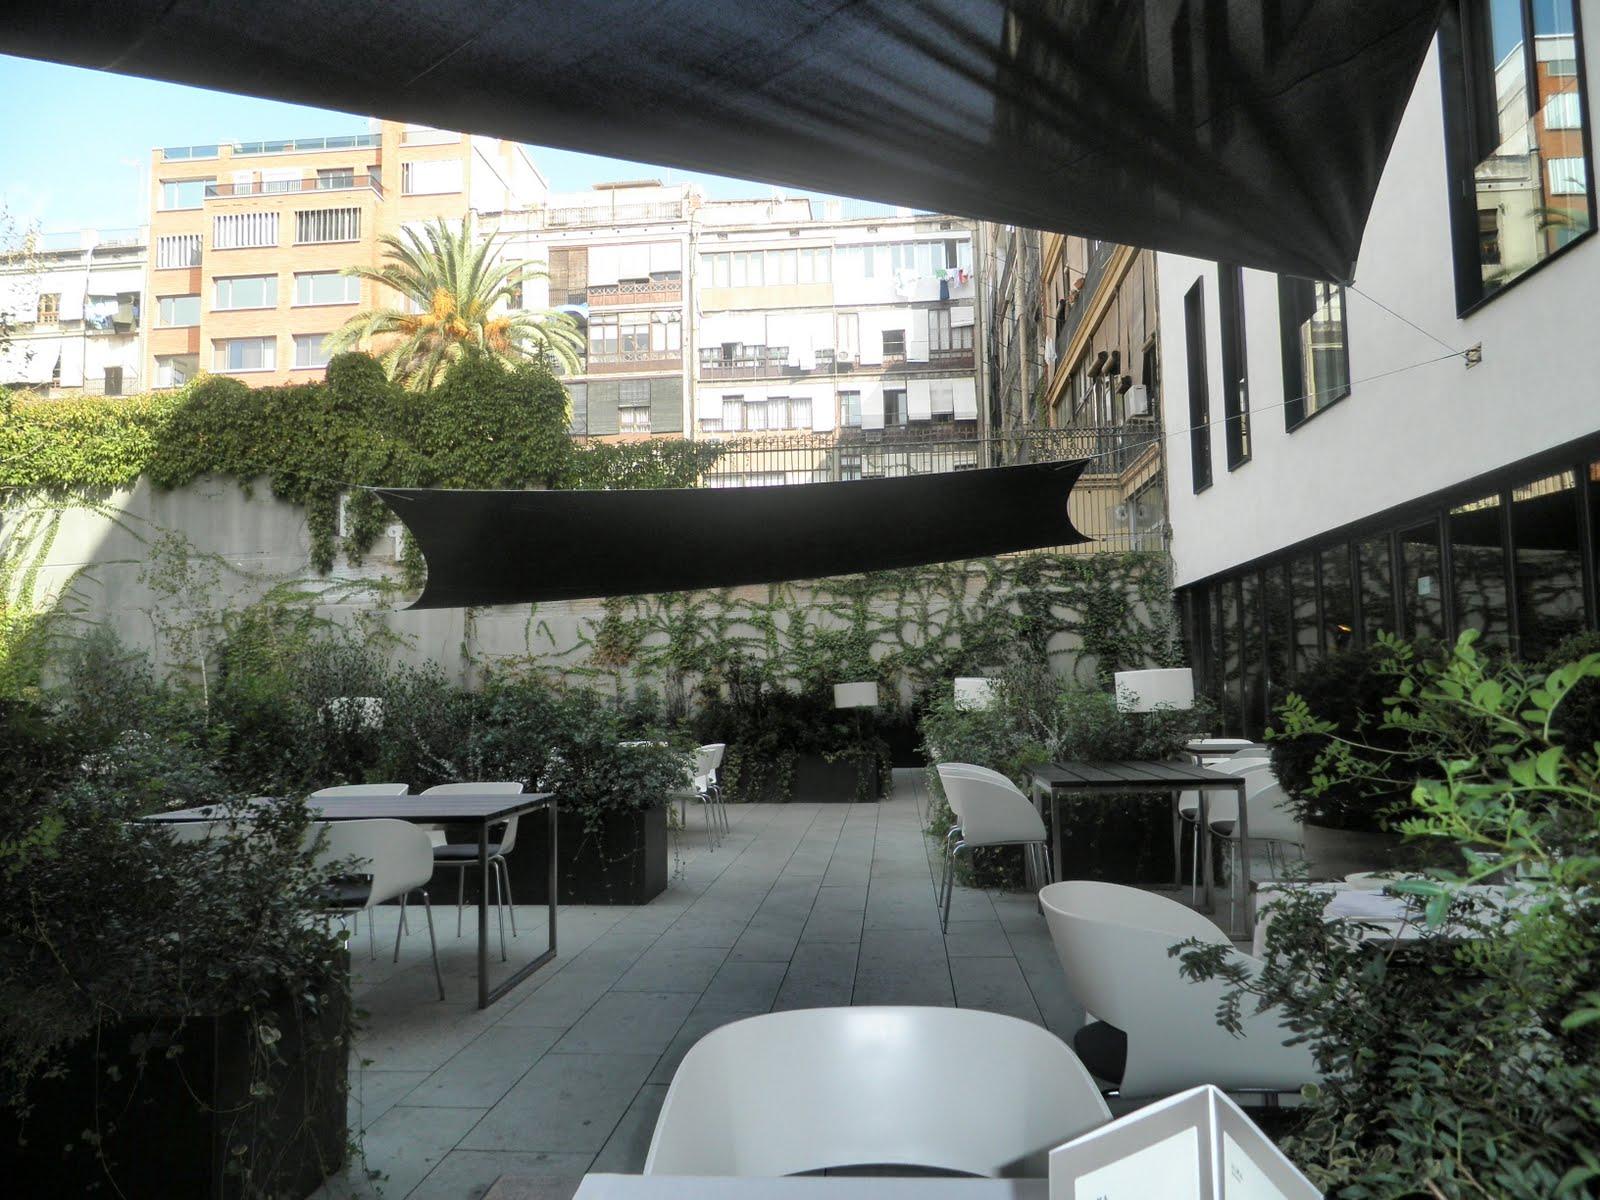 Observaci n gastron mica hotel alma barcelona - Restaurante alma barcelona ...